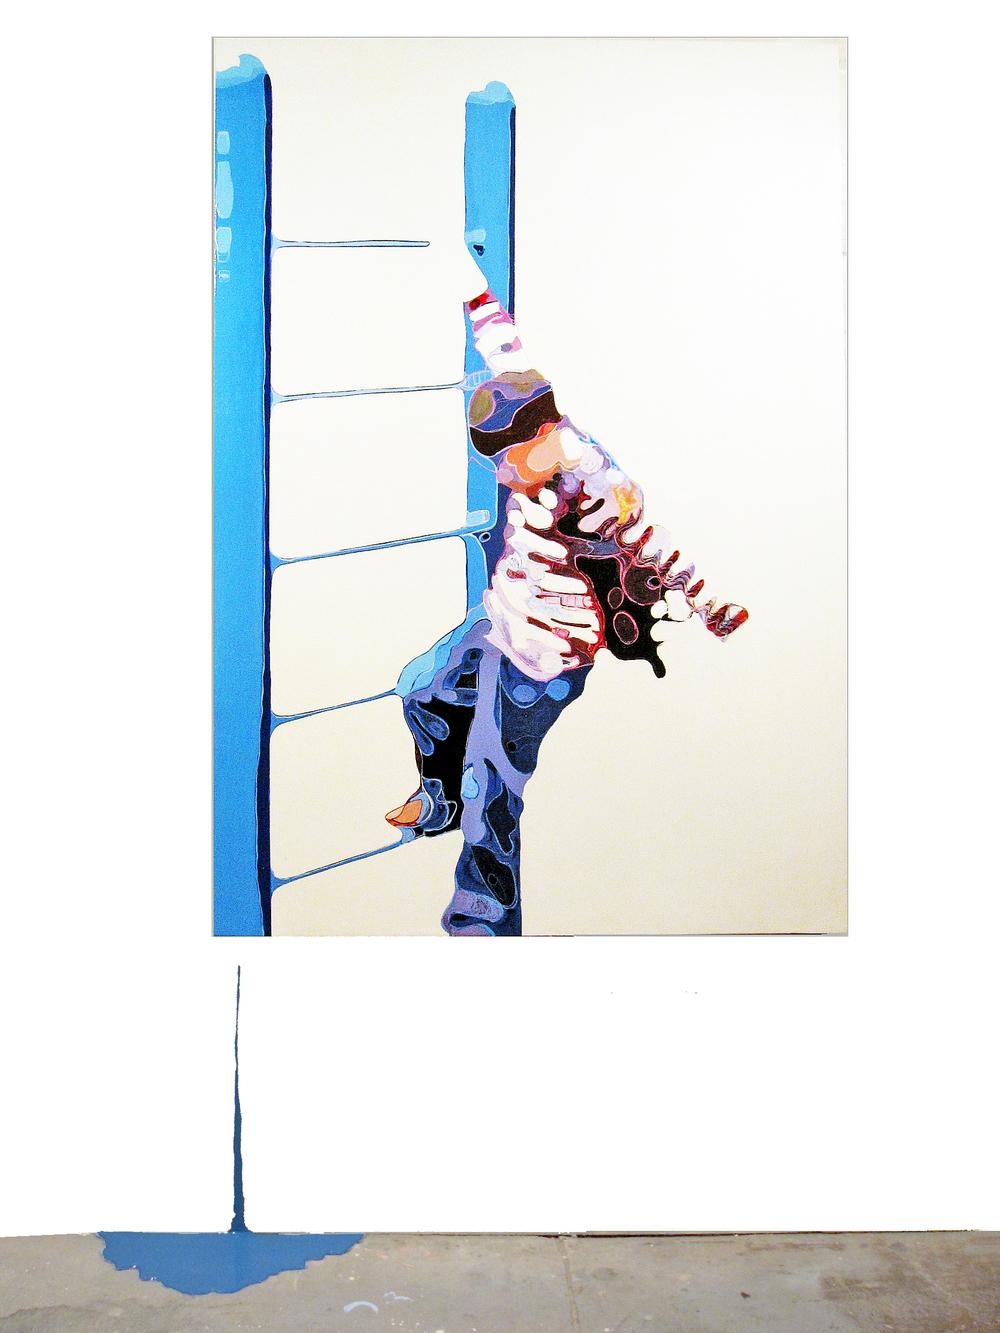 42x60_the_climb.jpg